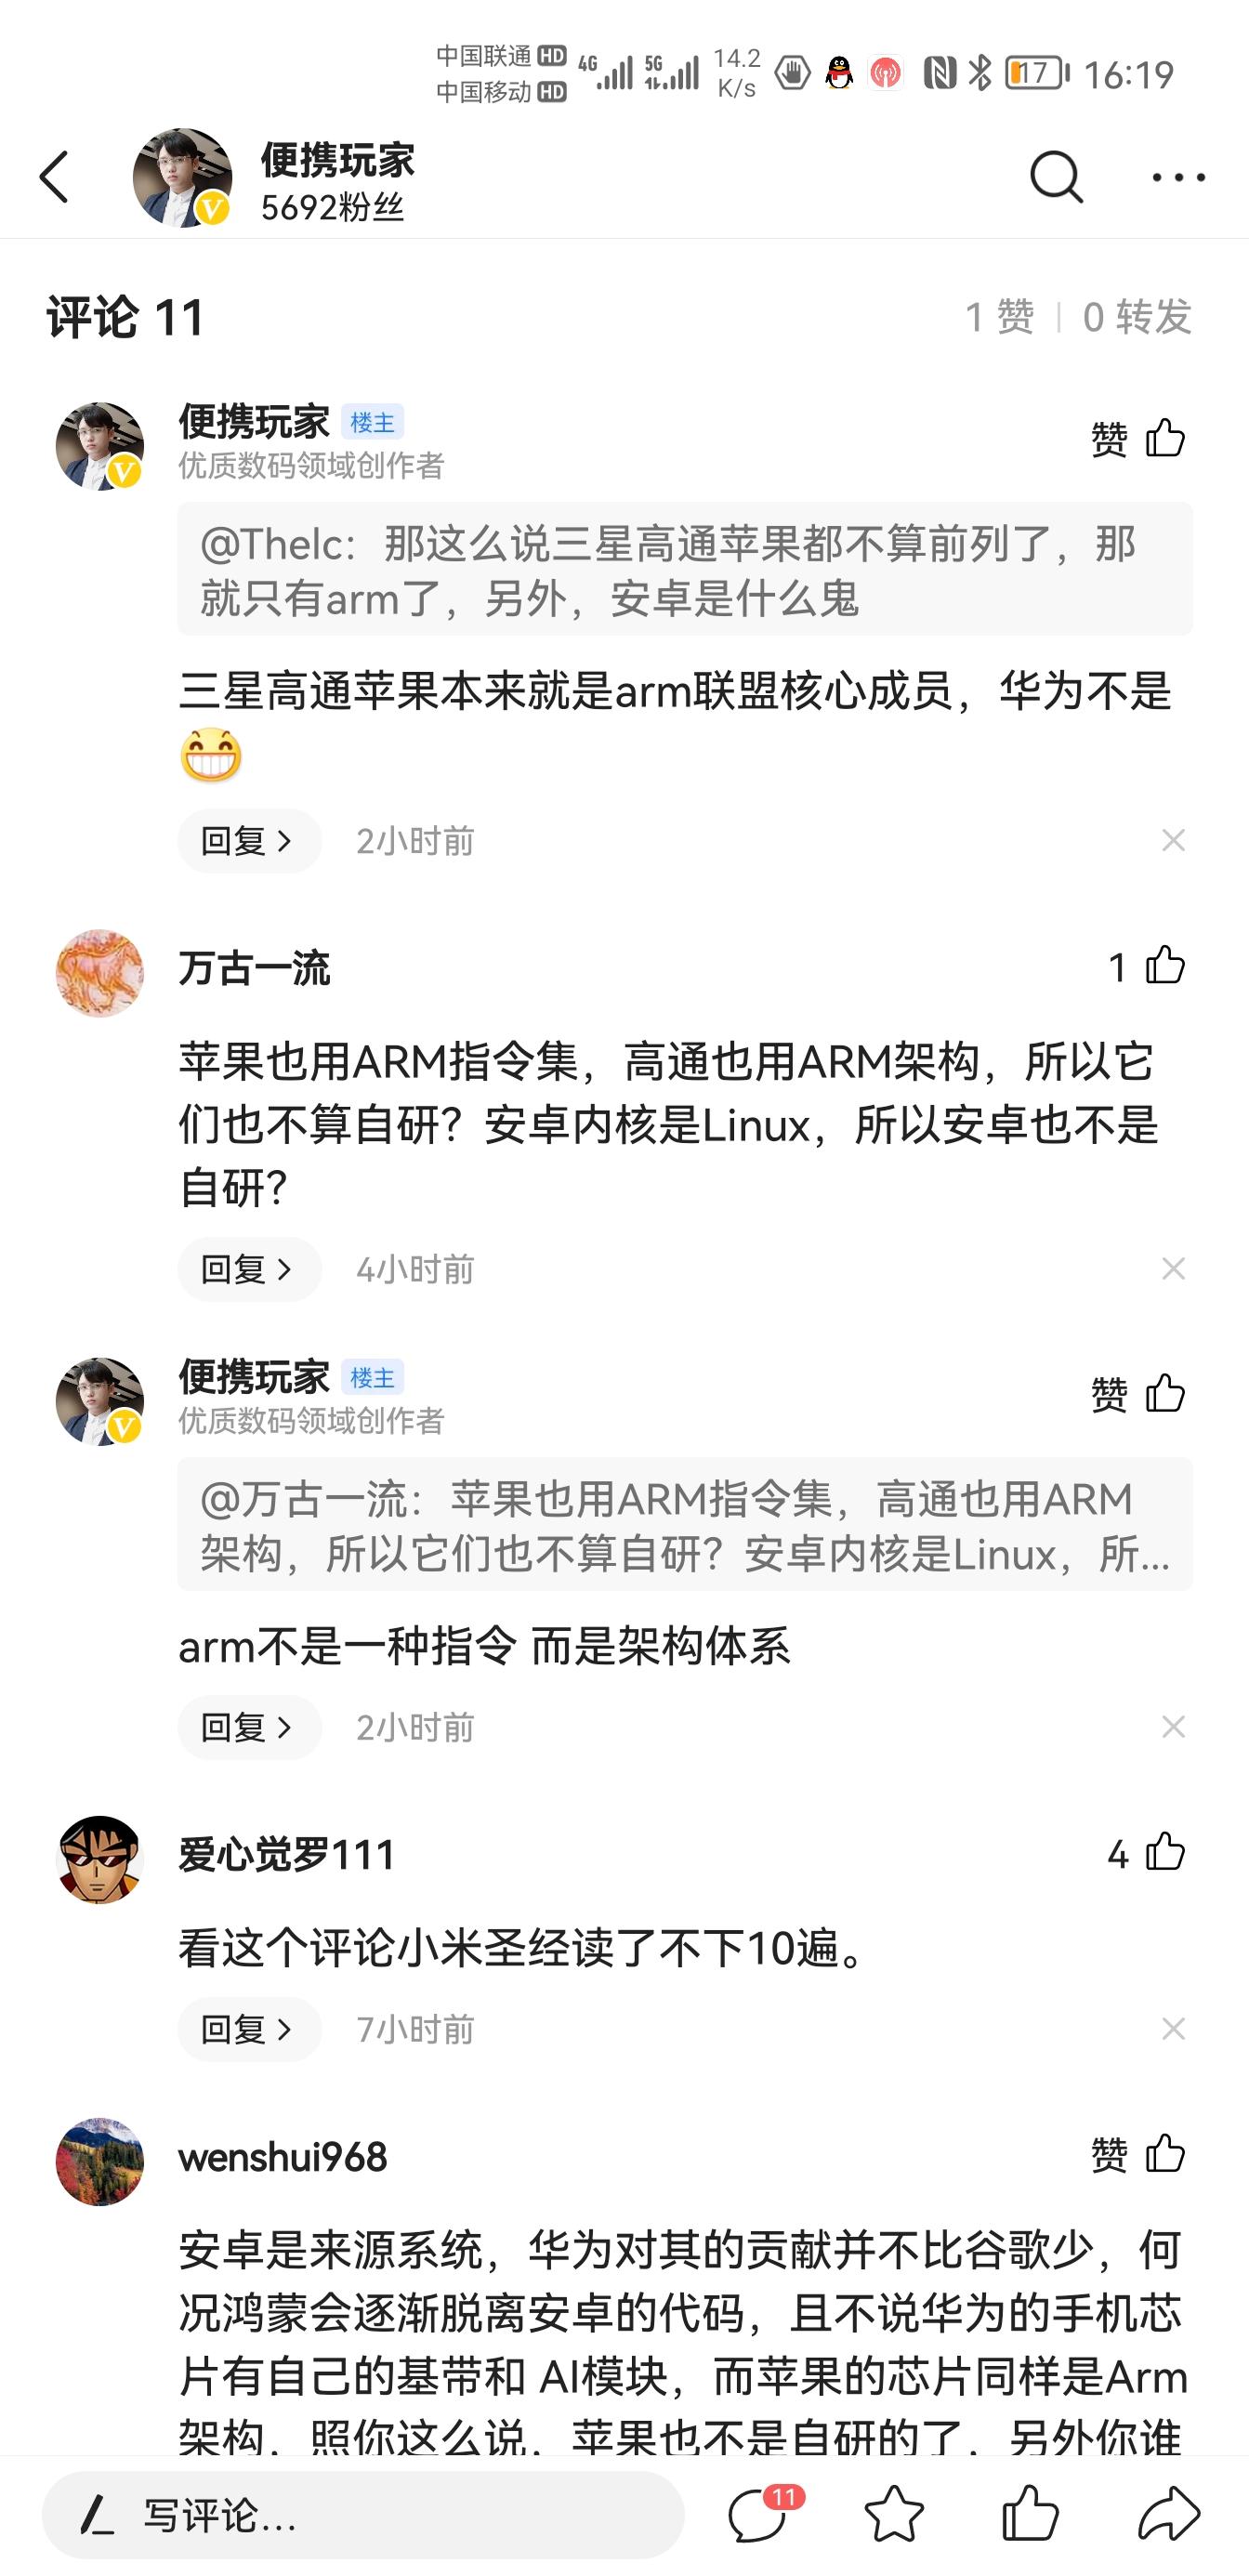 Screenshot_20210917_161933_com.ss.android.article.news.jpg